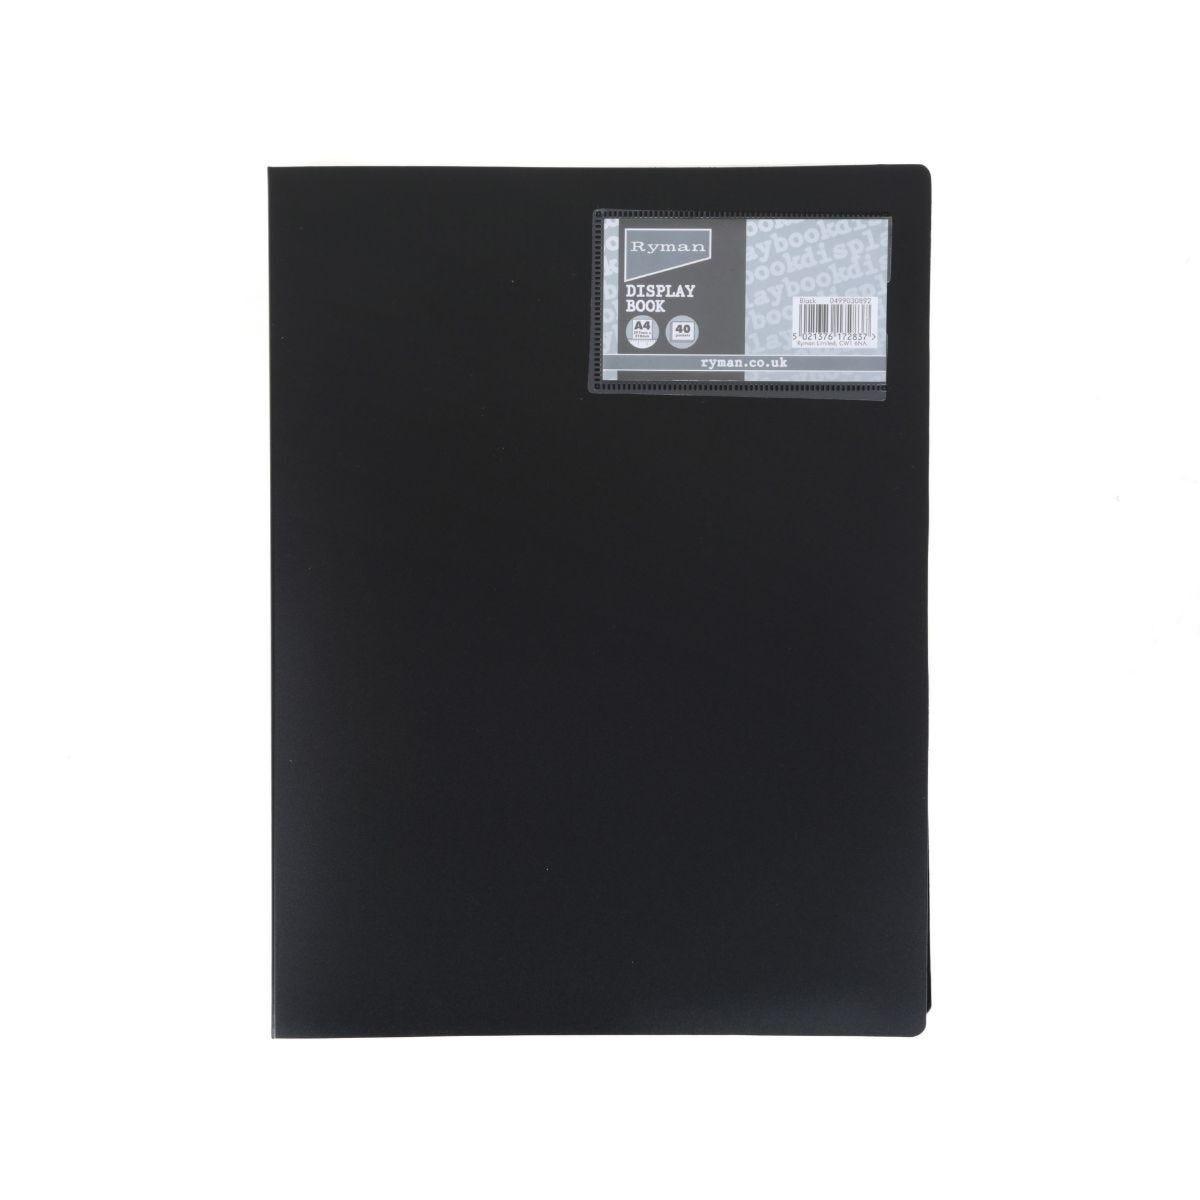 Ryman Display Book A4 40 Pocket Black